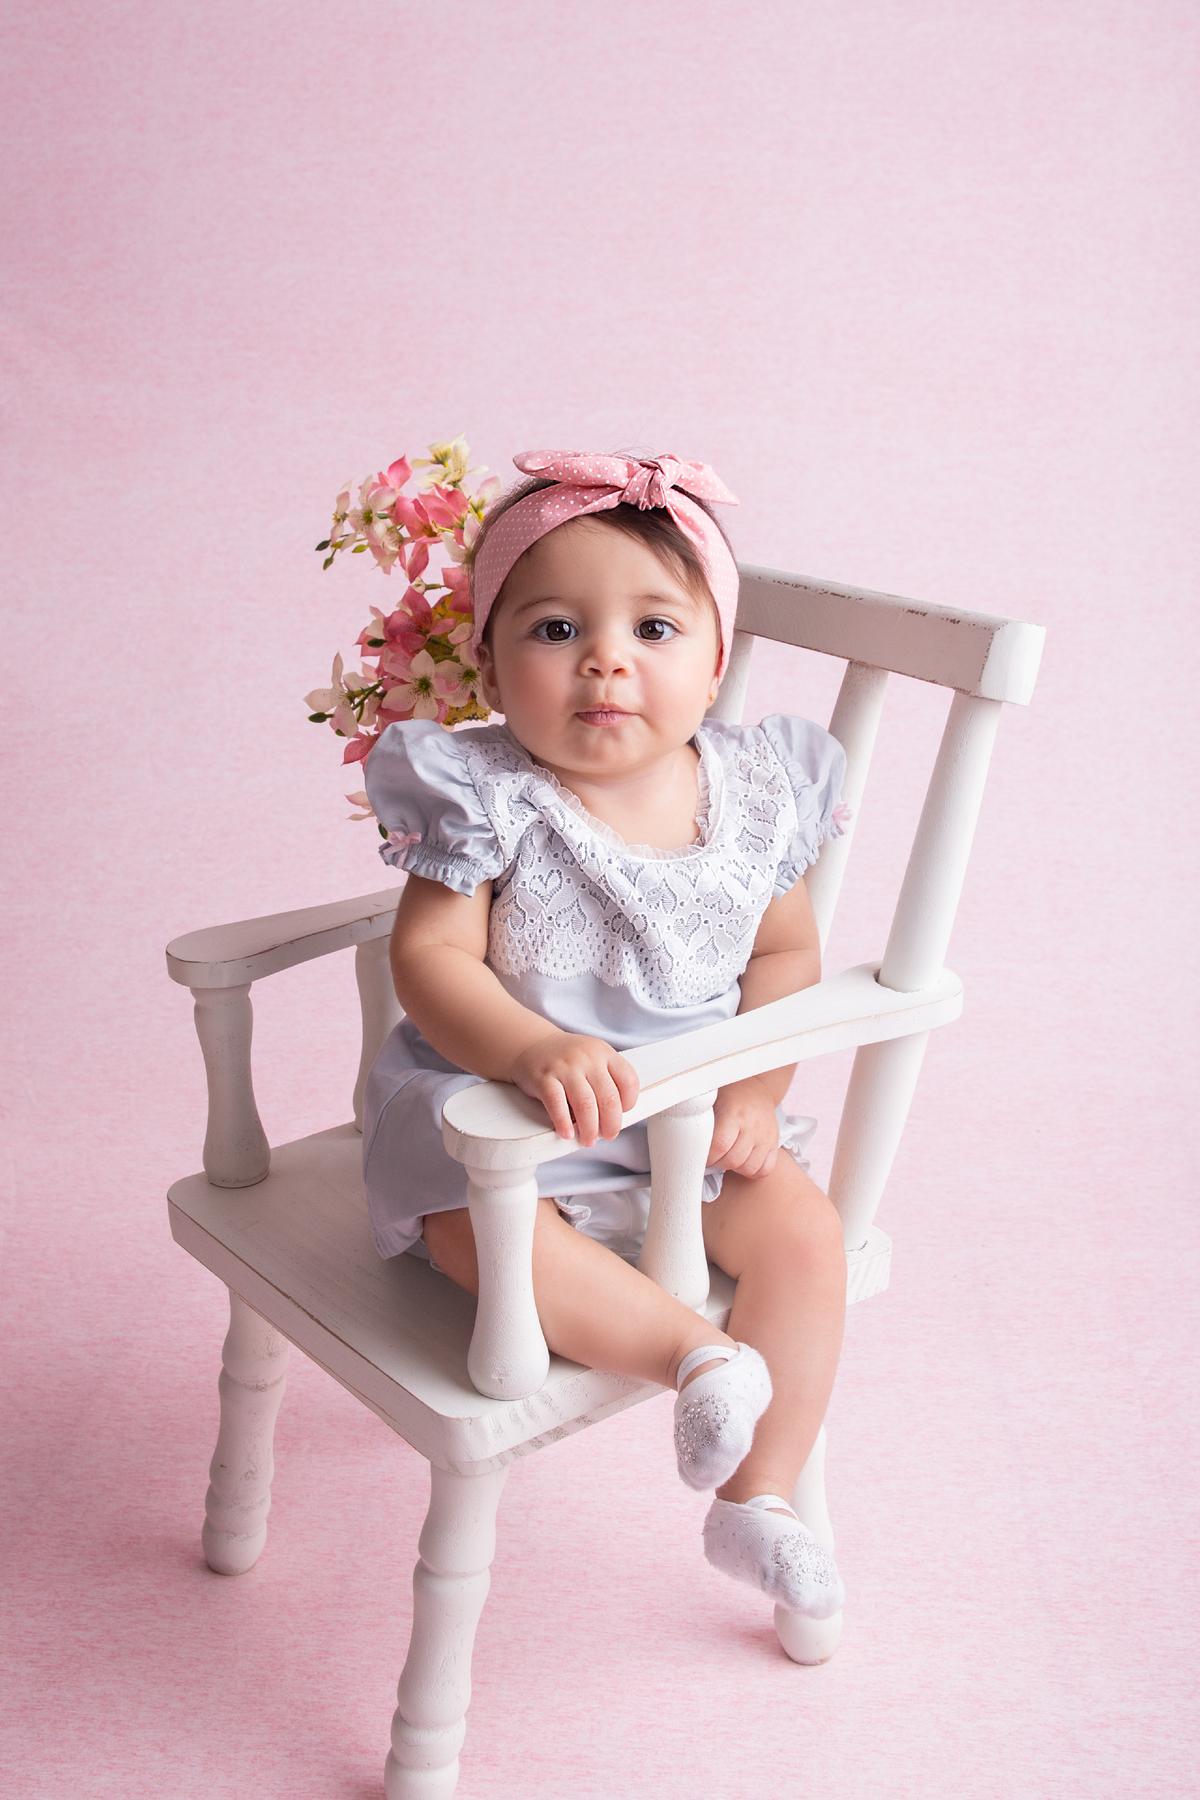 Bebe Menina, fundo rosa, primeiro ano do bebê, Brasilia